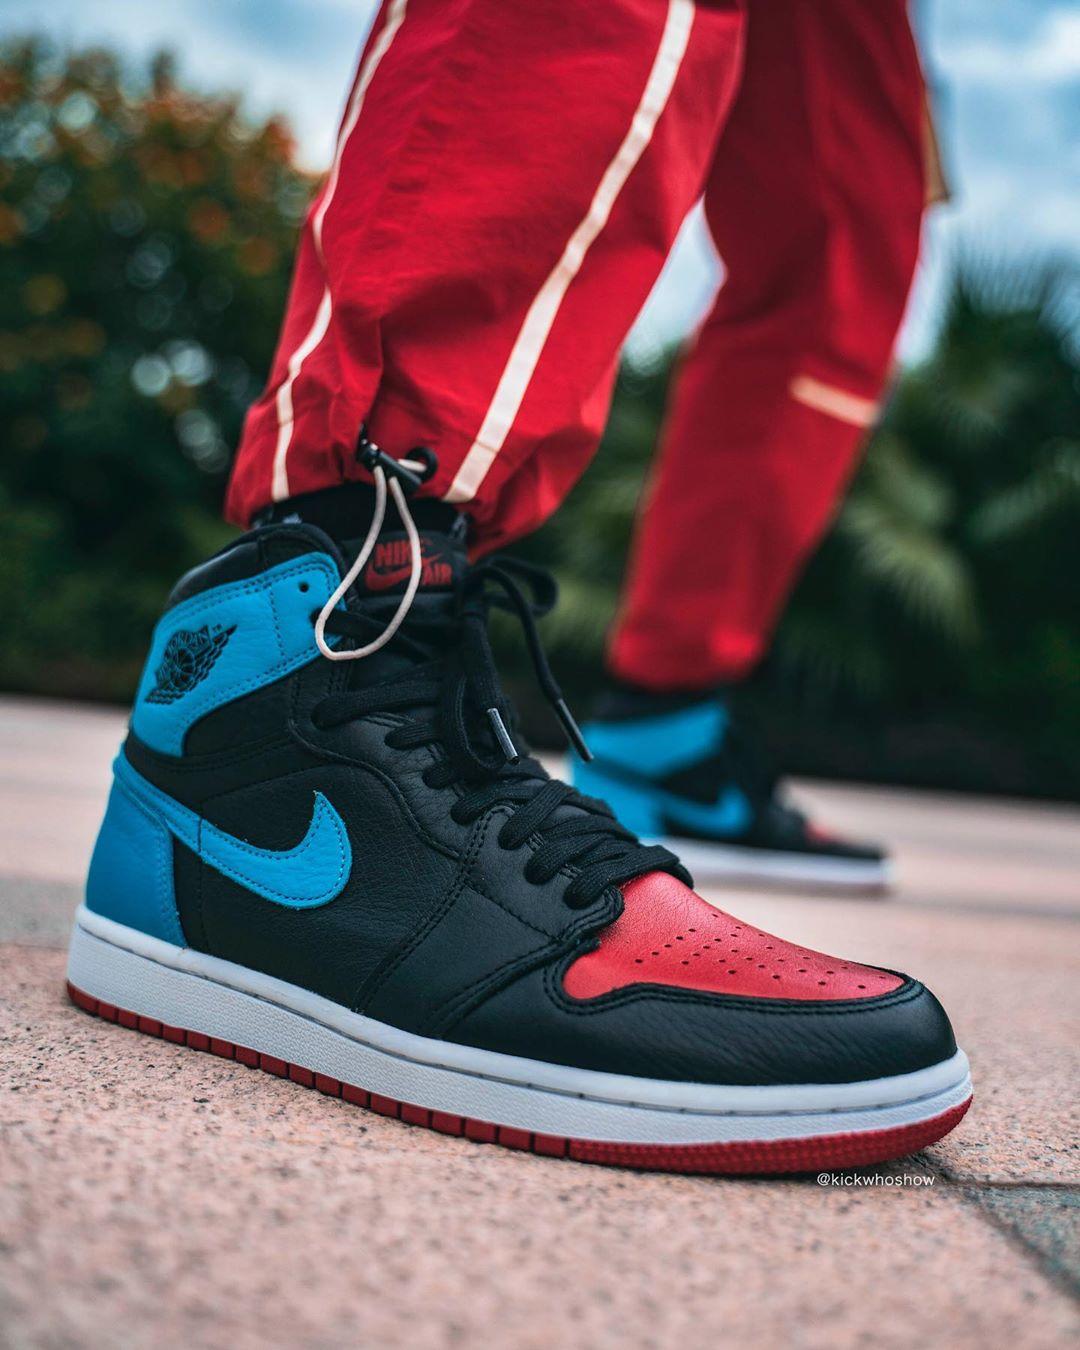 Air Jordan 1,AJ1,发售,Jordan bra 看完上脚真香了吗?「警灯 2.0」Air Jordan 1 情人节发售!